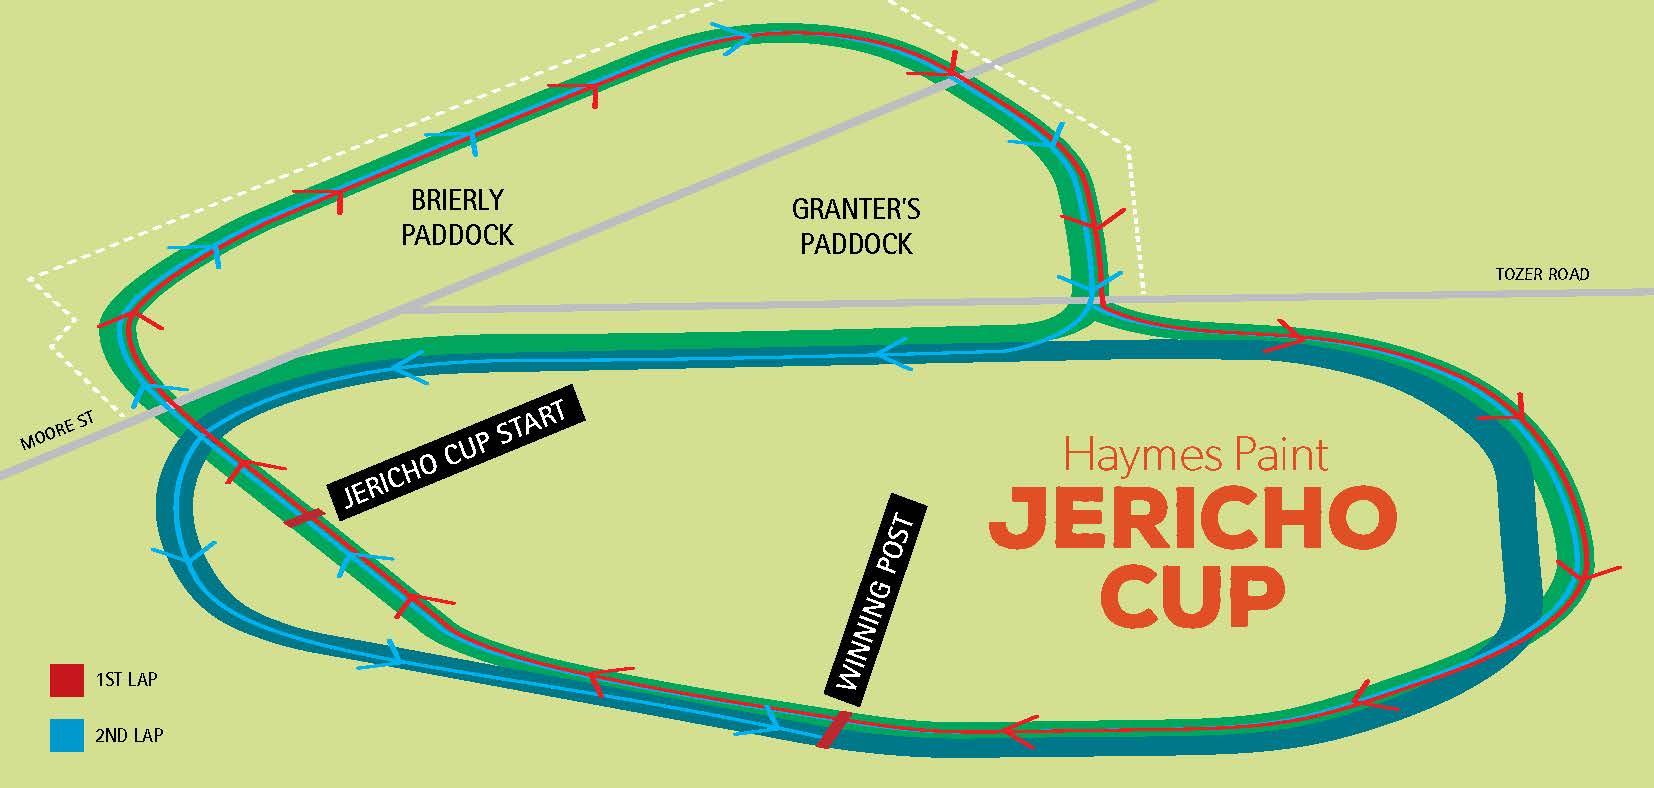 Jericho Cup Map Race Course.jpg